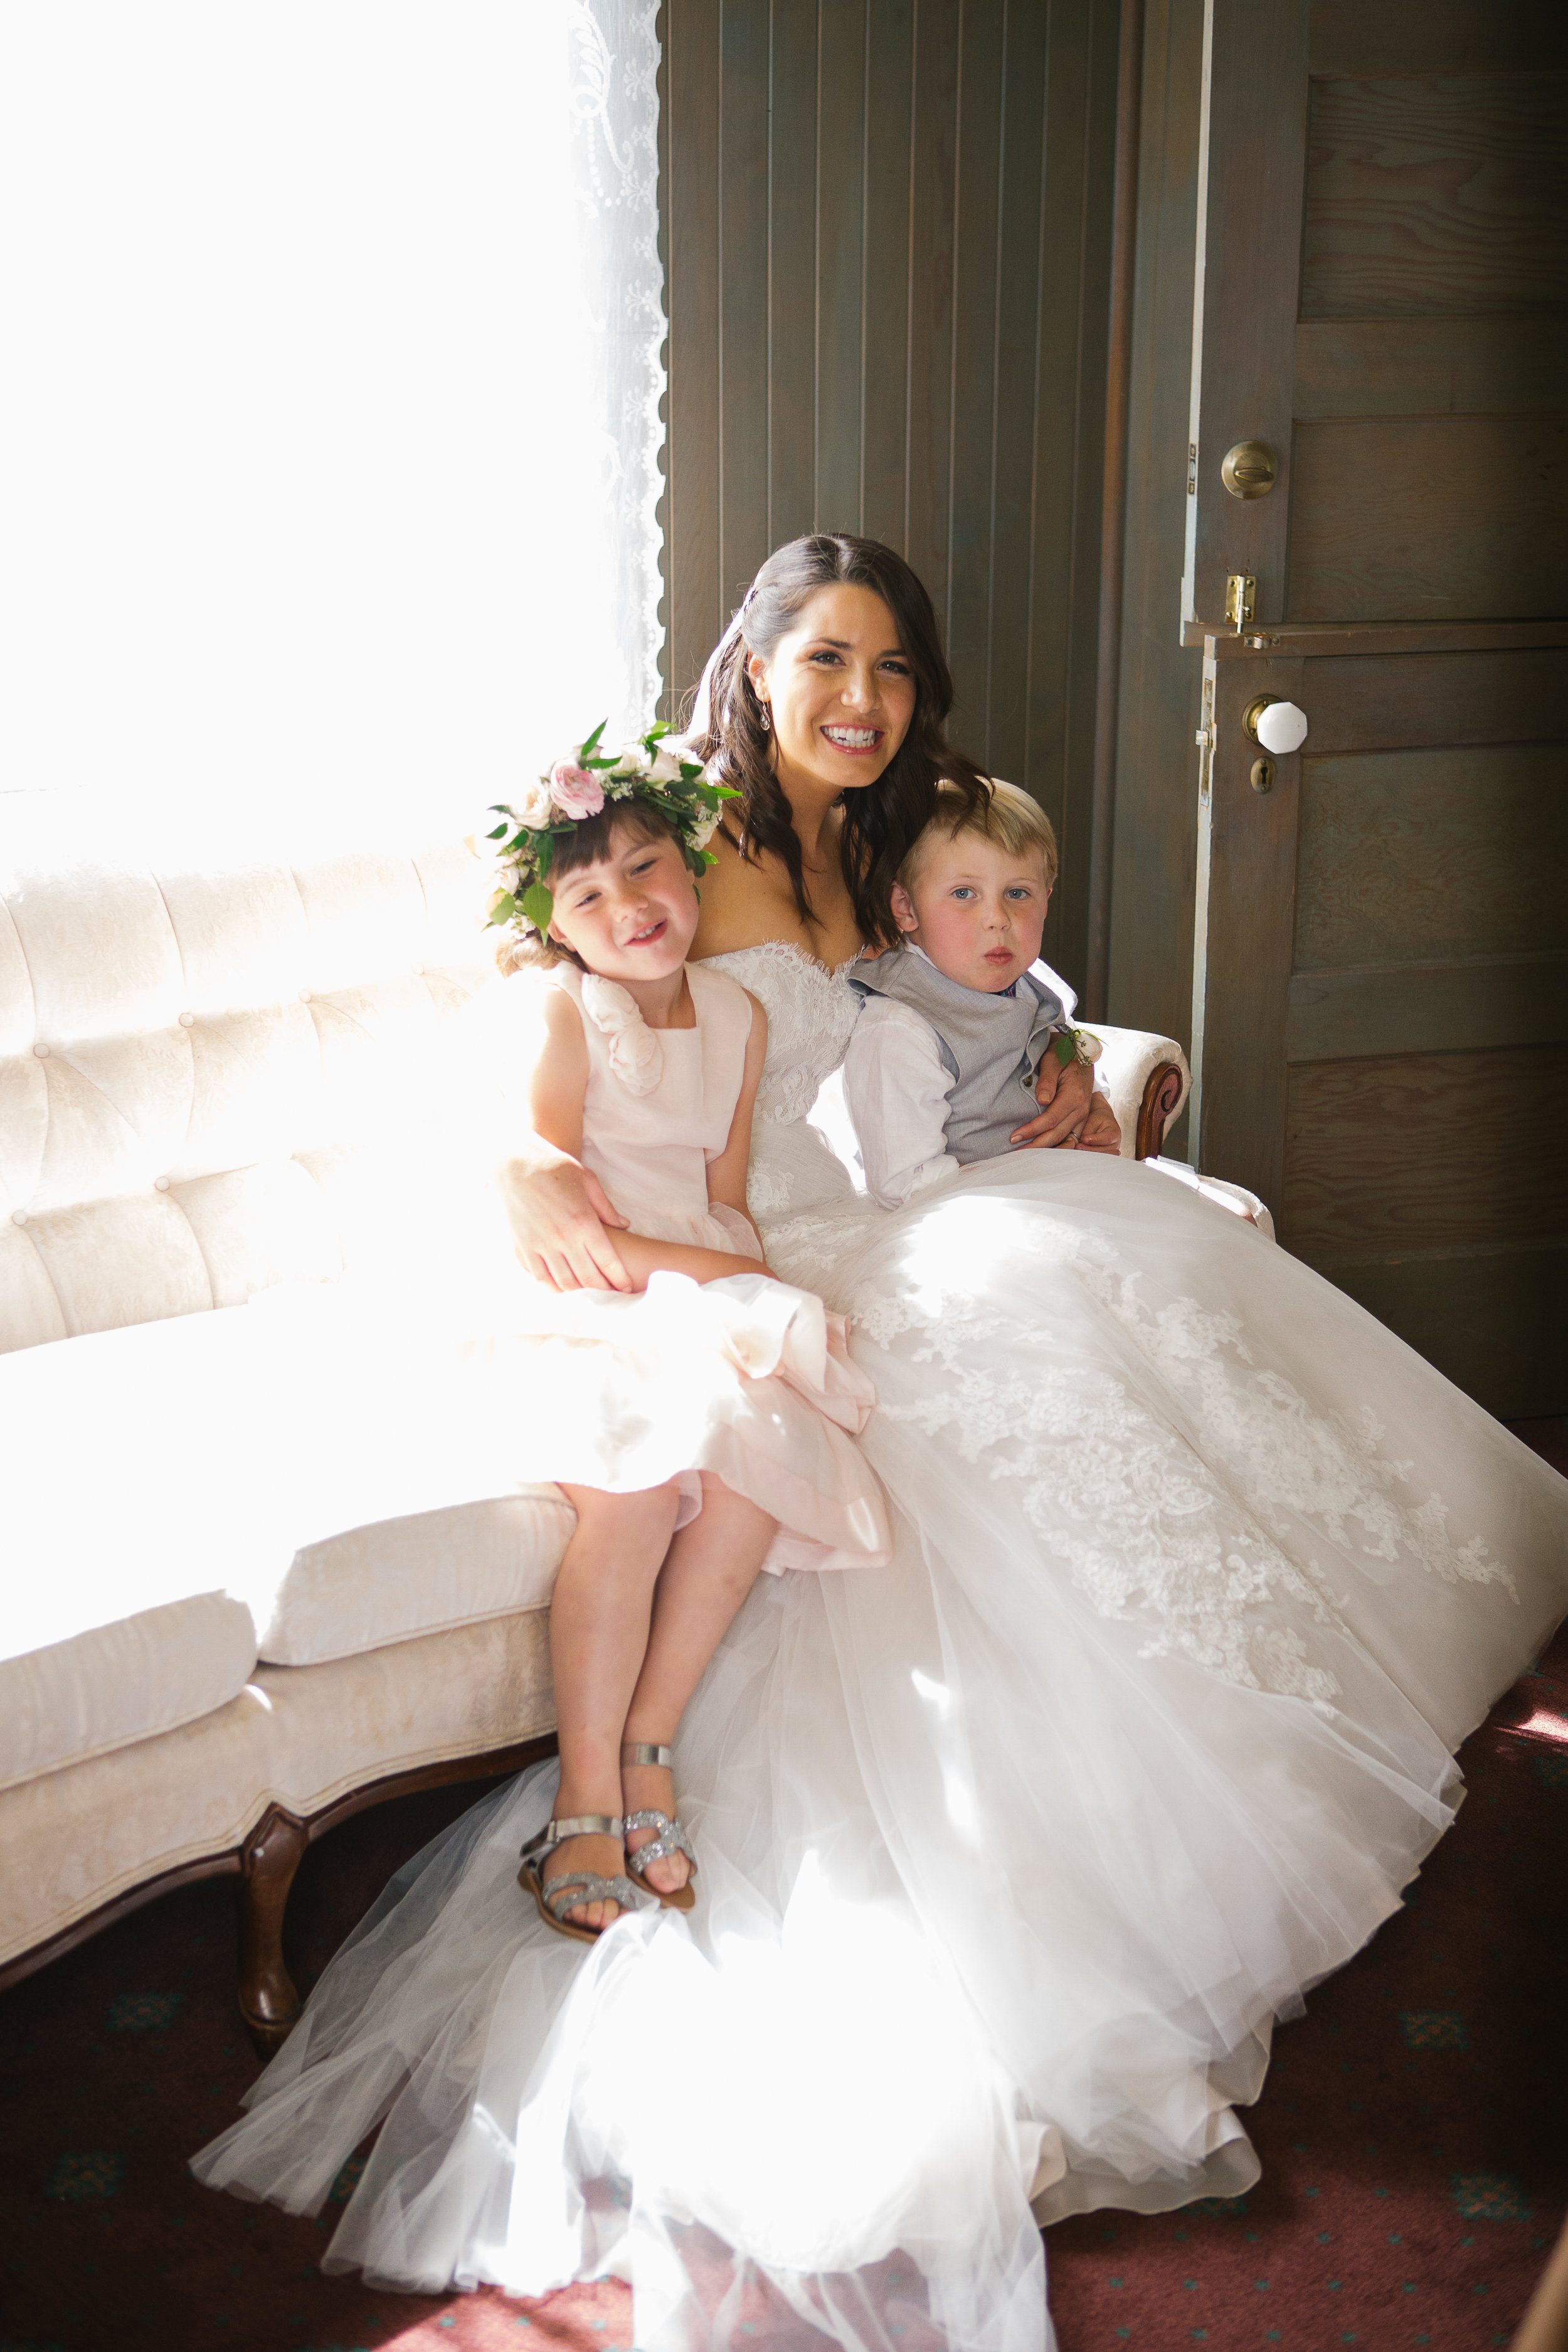 Ryan-Kaatie-Wedding-248.jpg